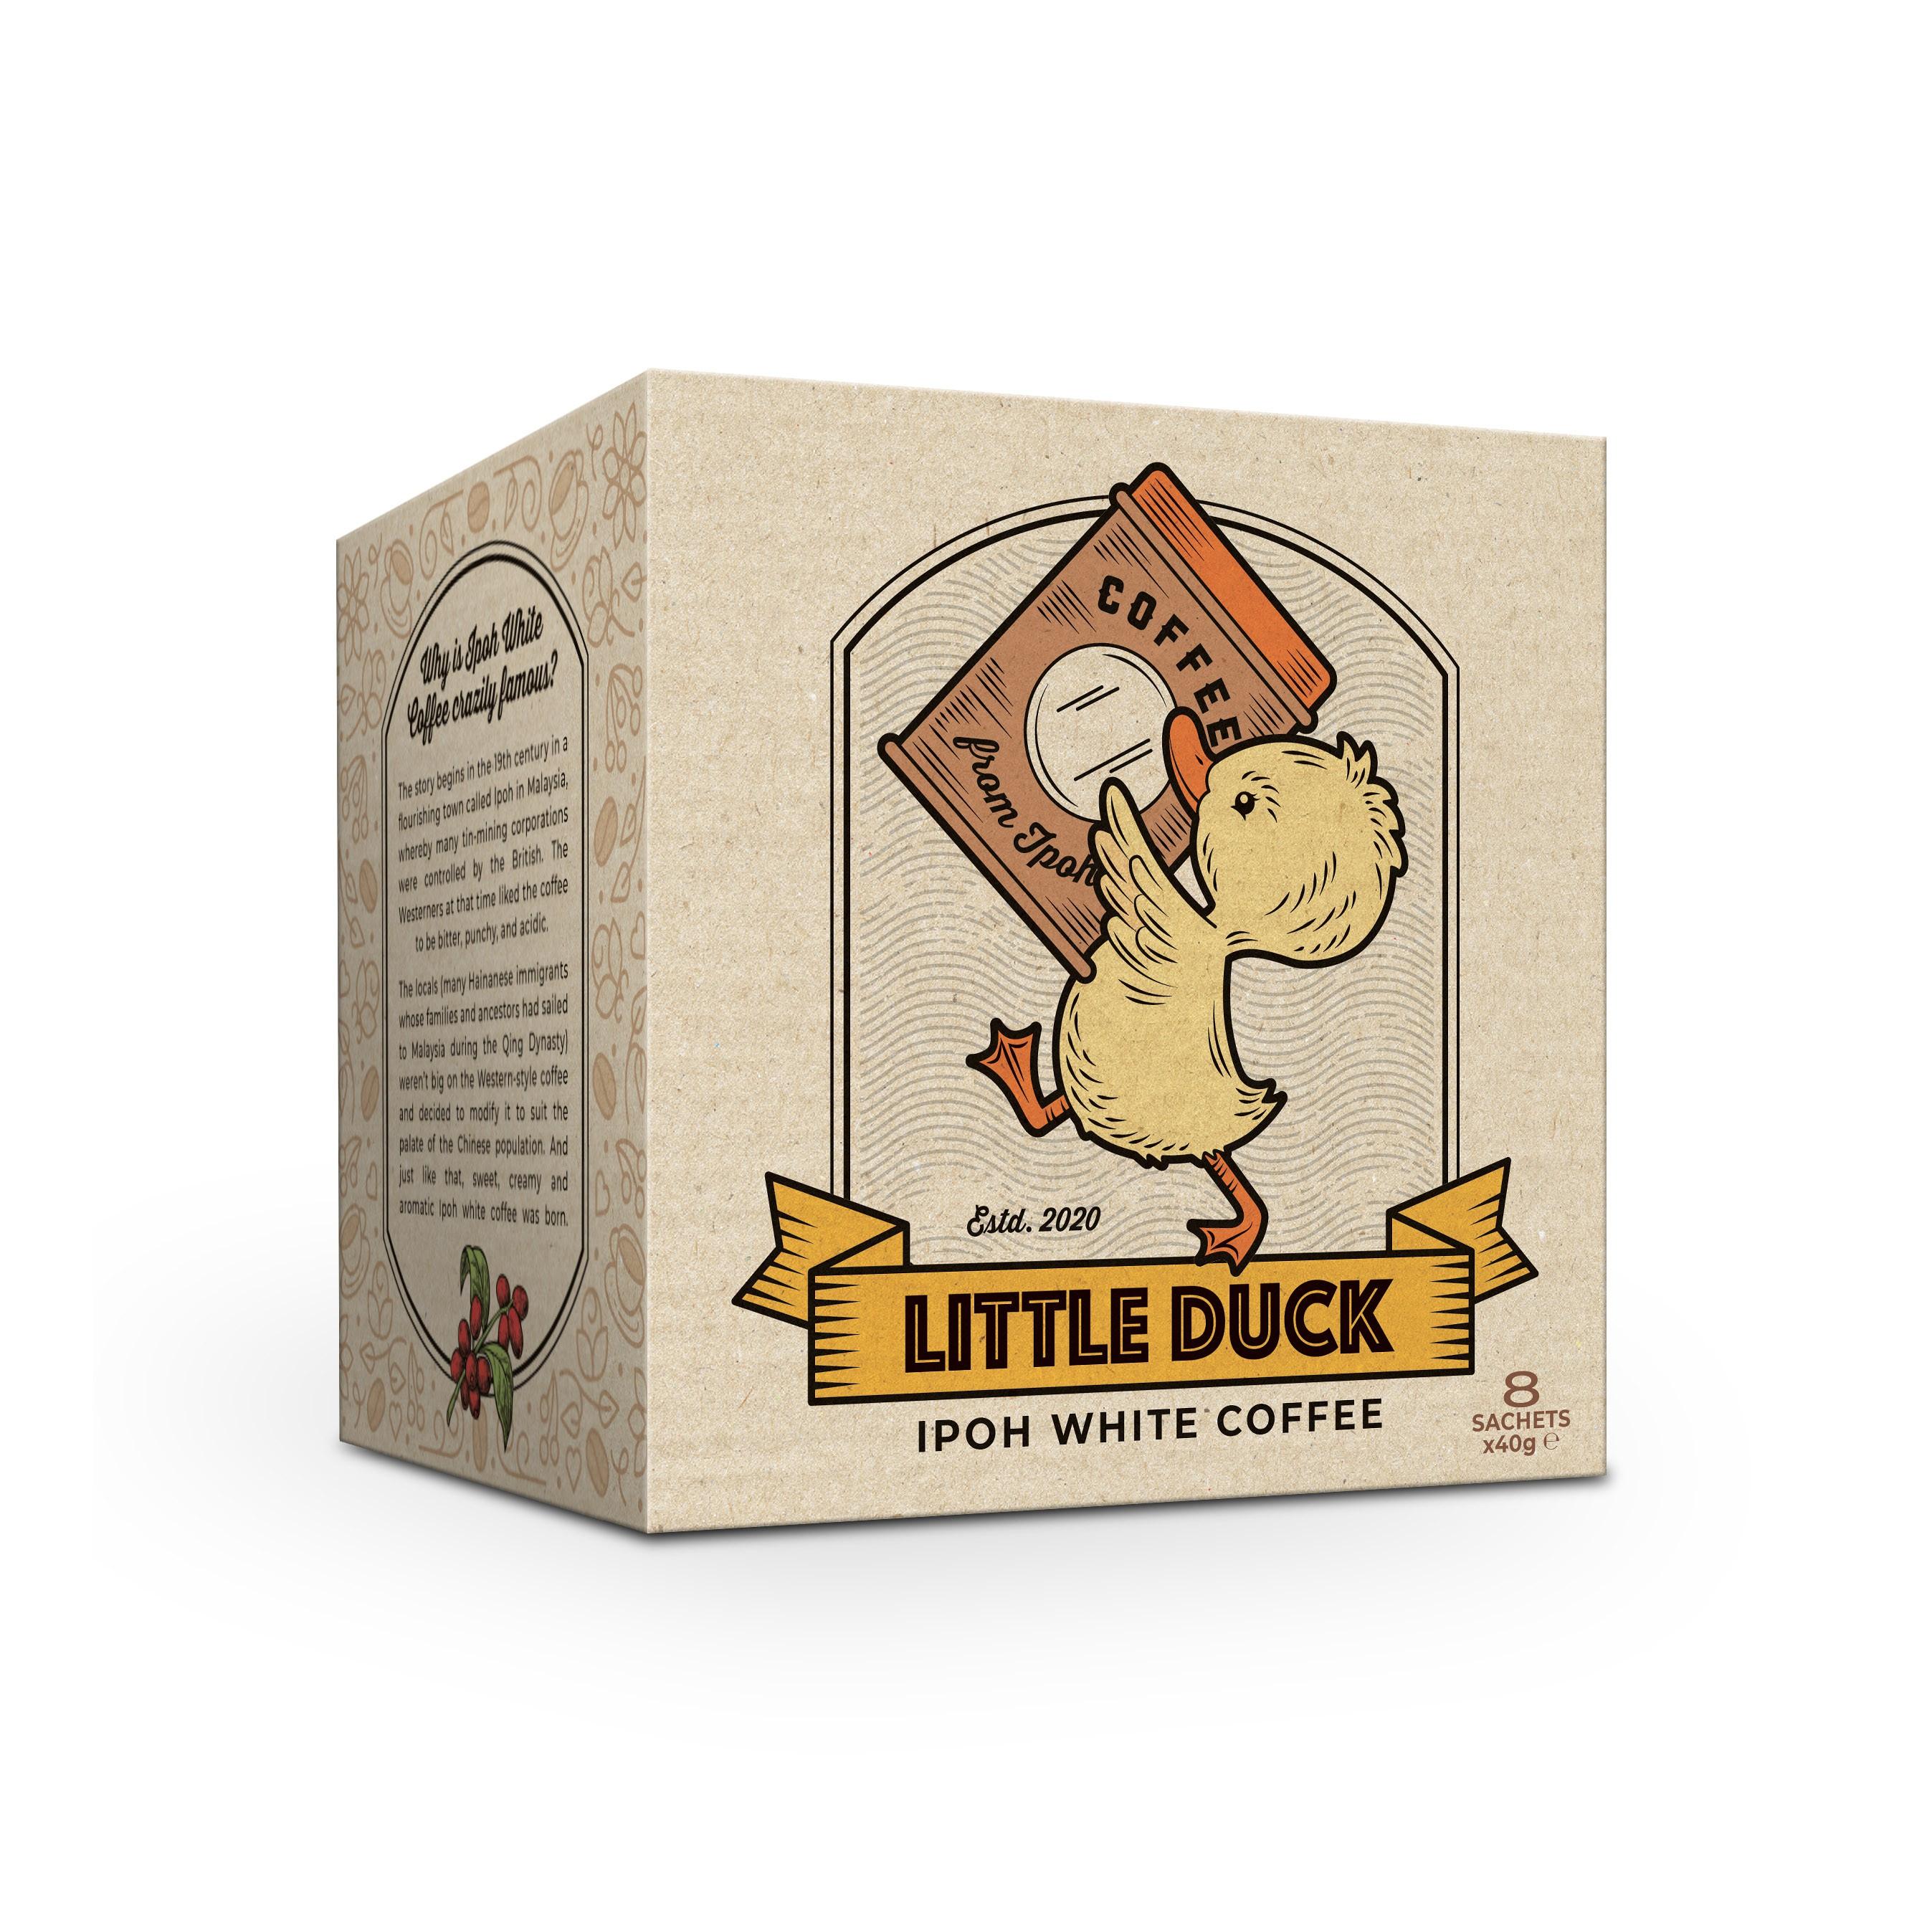 Little Duck - Box Design for White Coffee